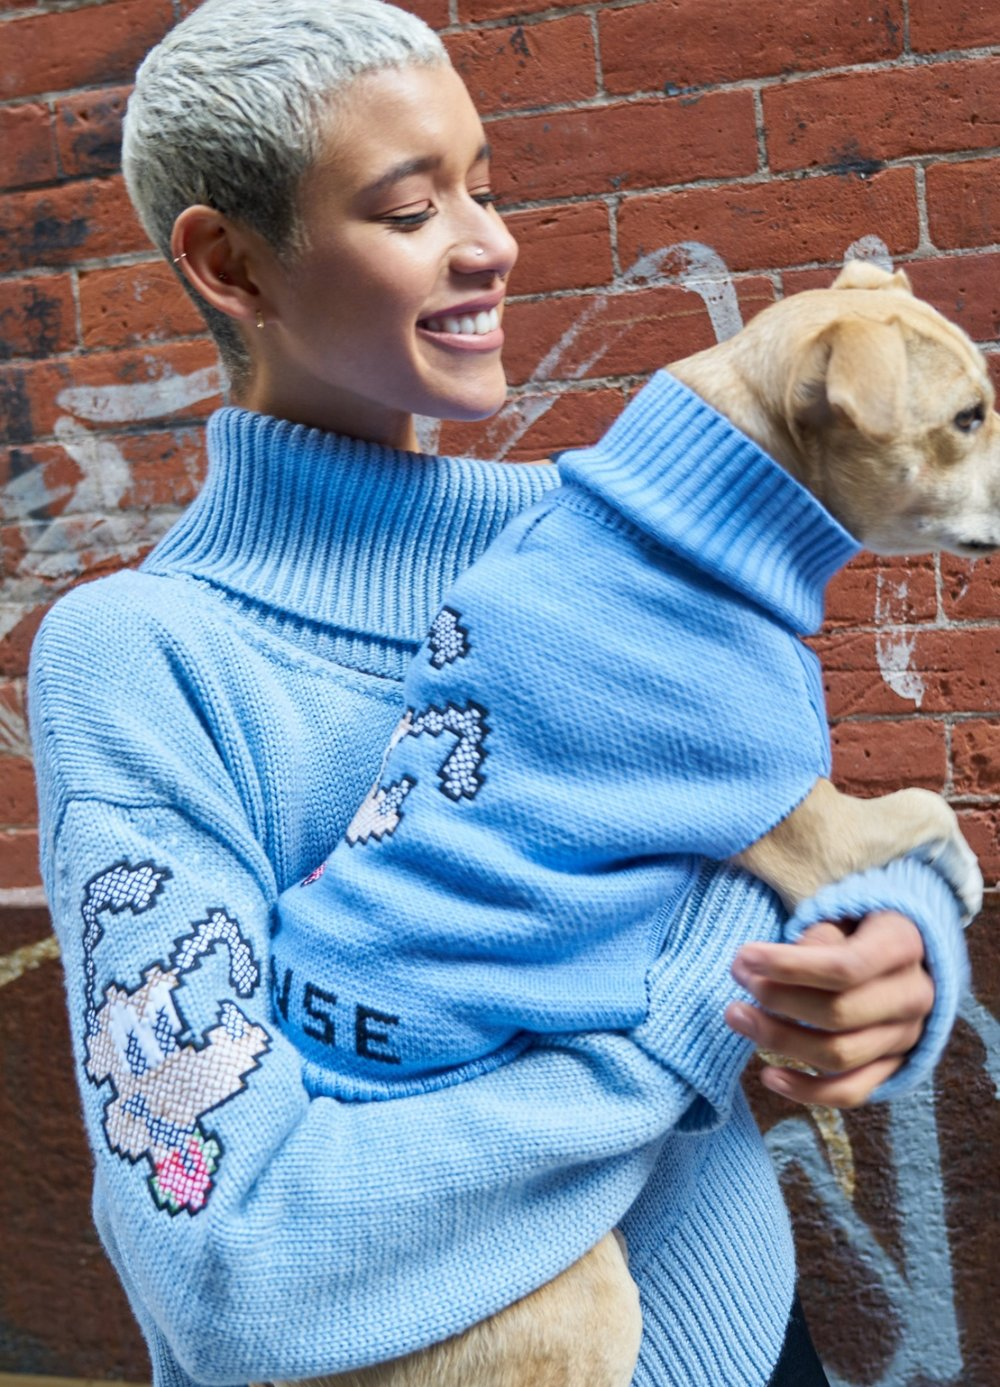 monse-dog-sweater-bunny-cross-stitch-blue.jpg